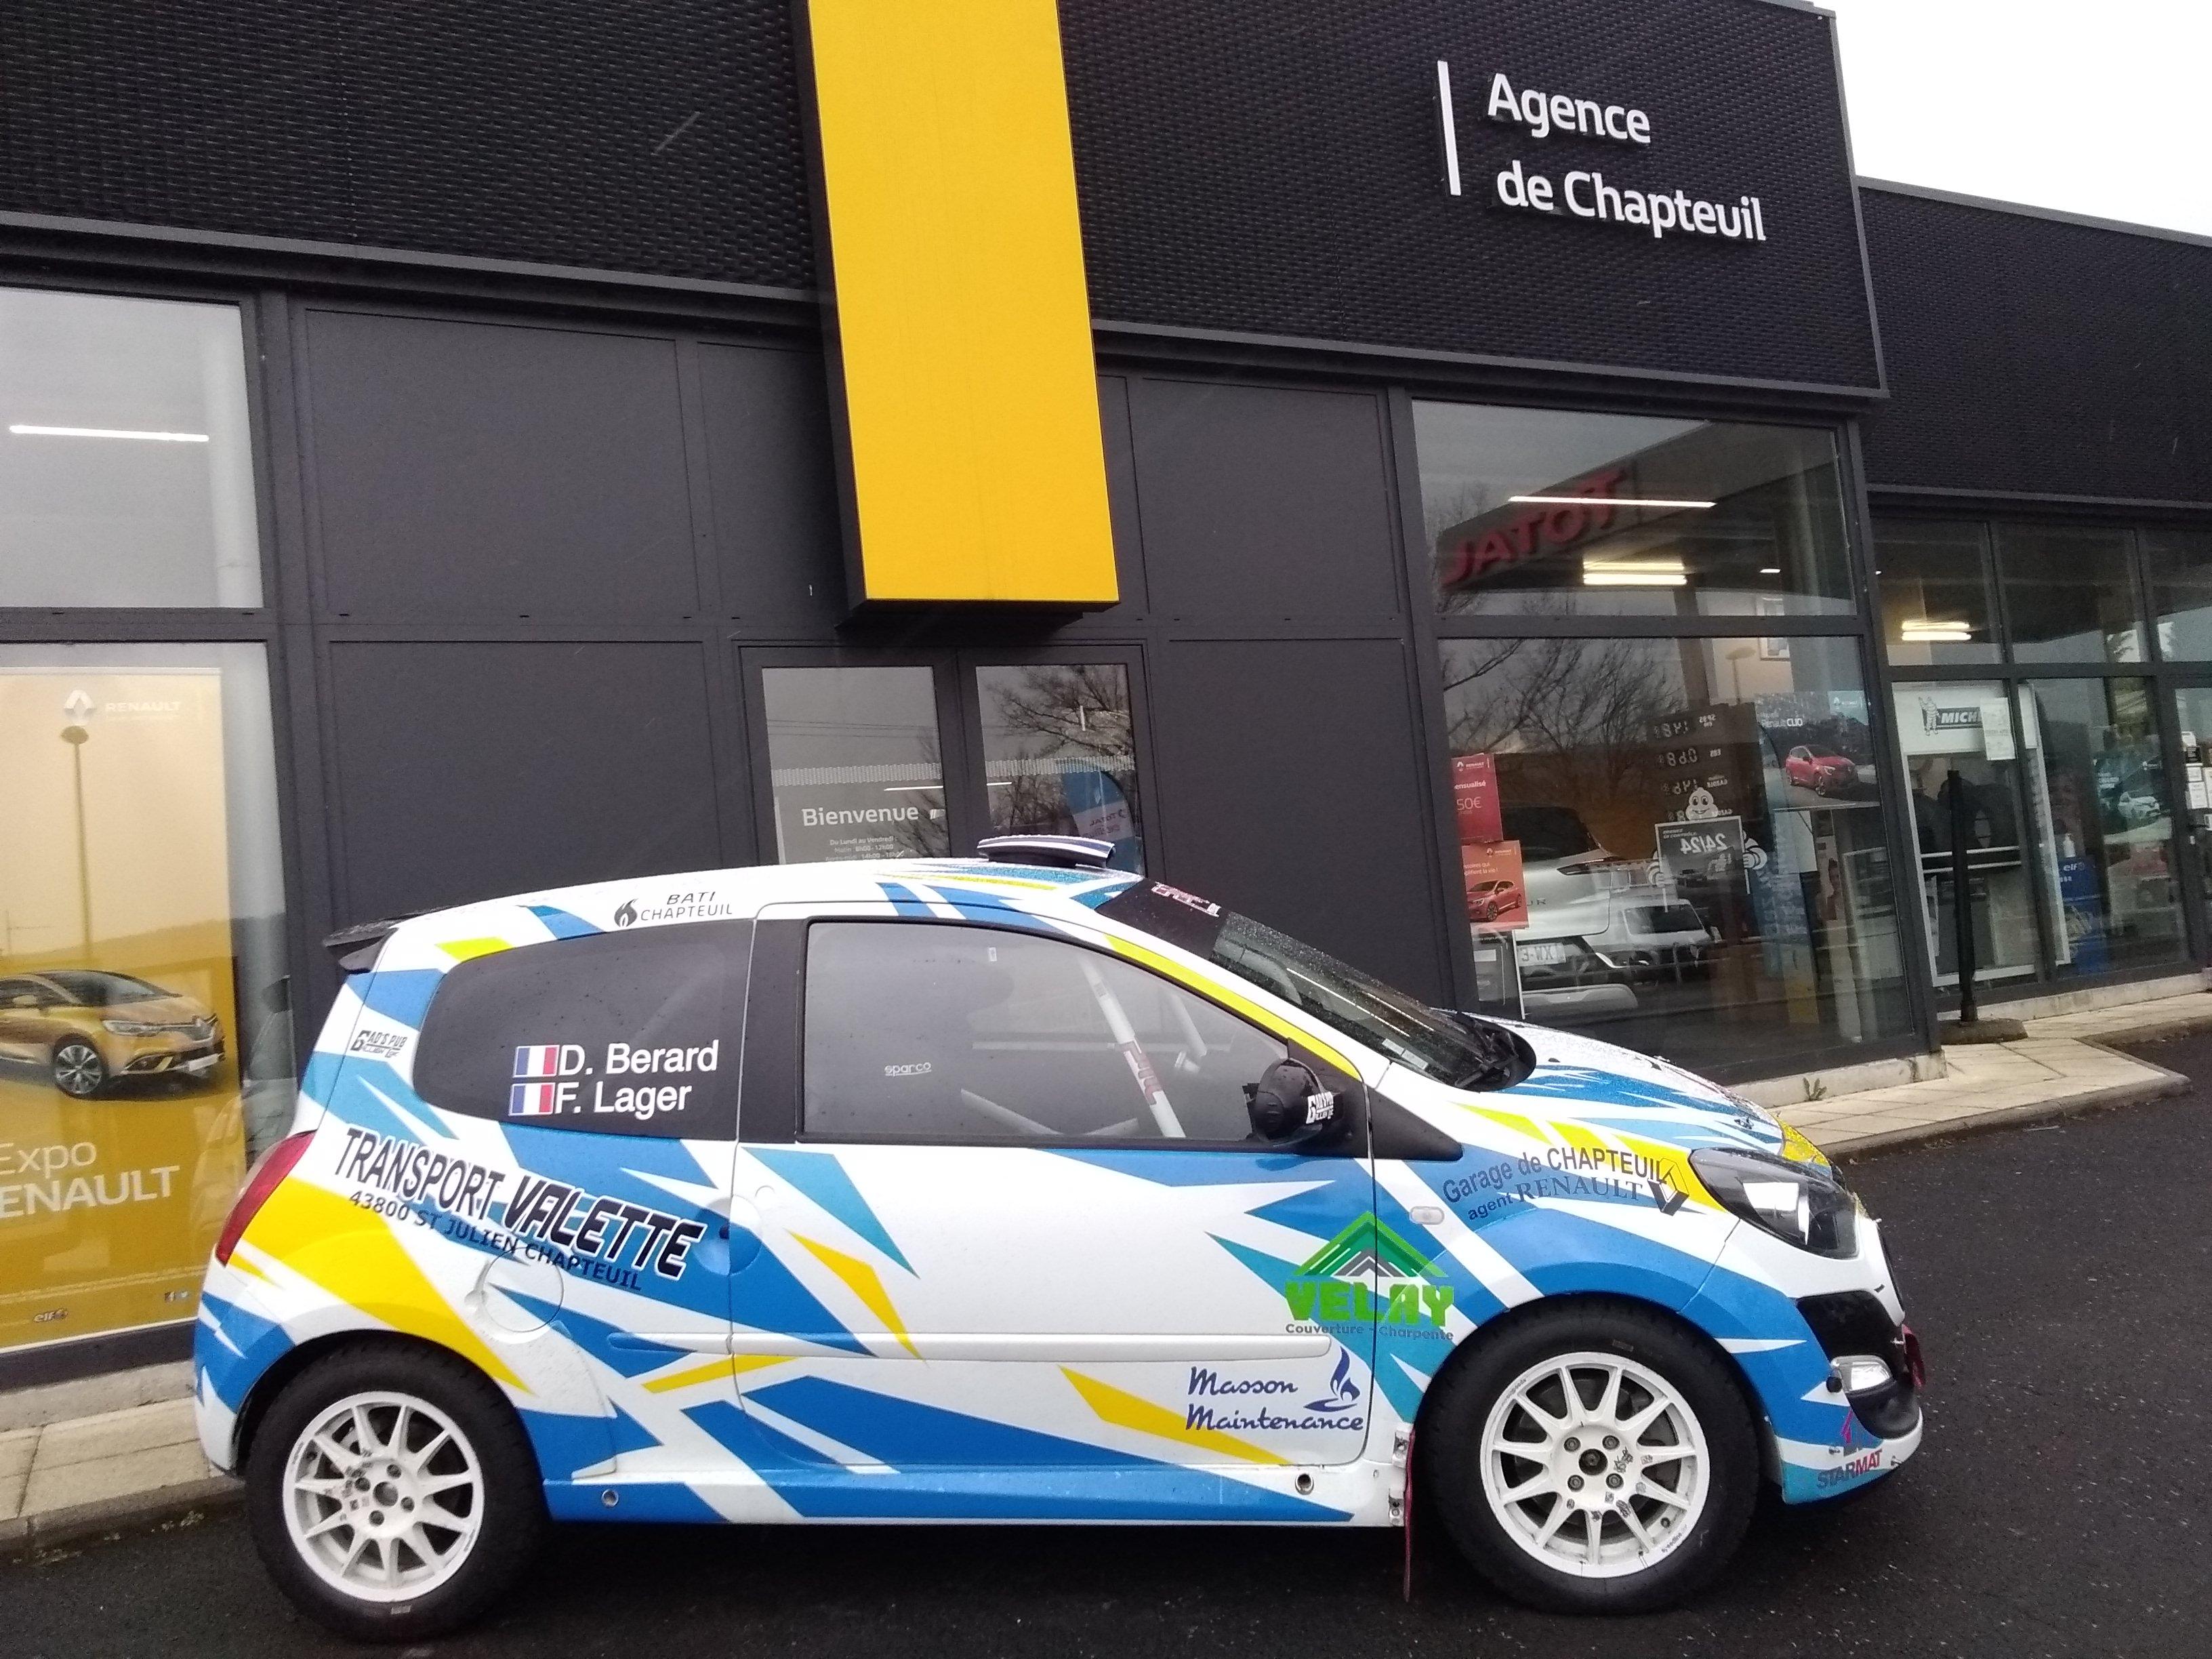 3eme journée rallye Monte-Carlo 230121 Frederic Lager et David Berard